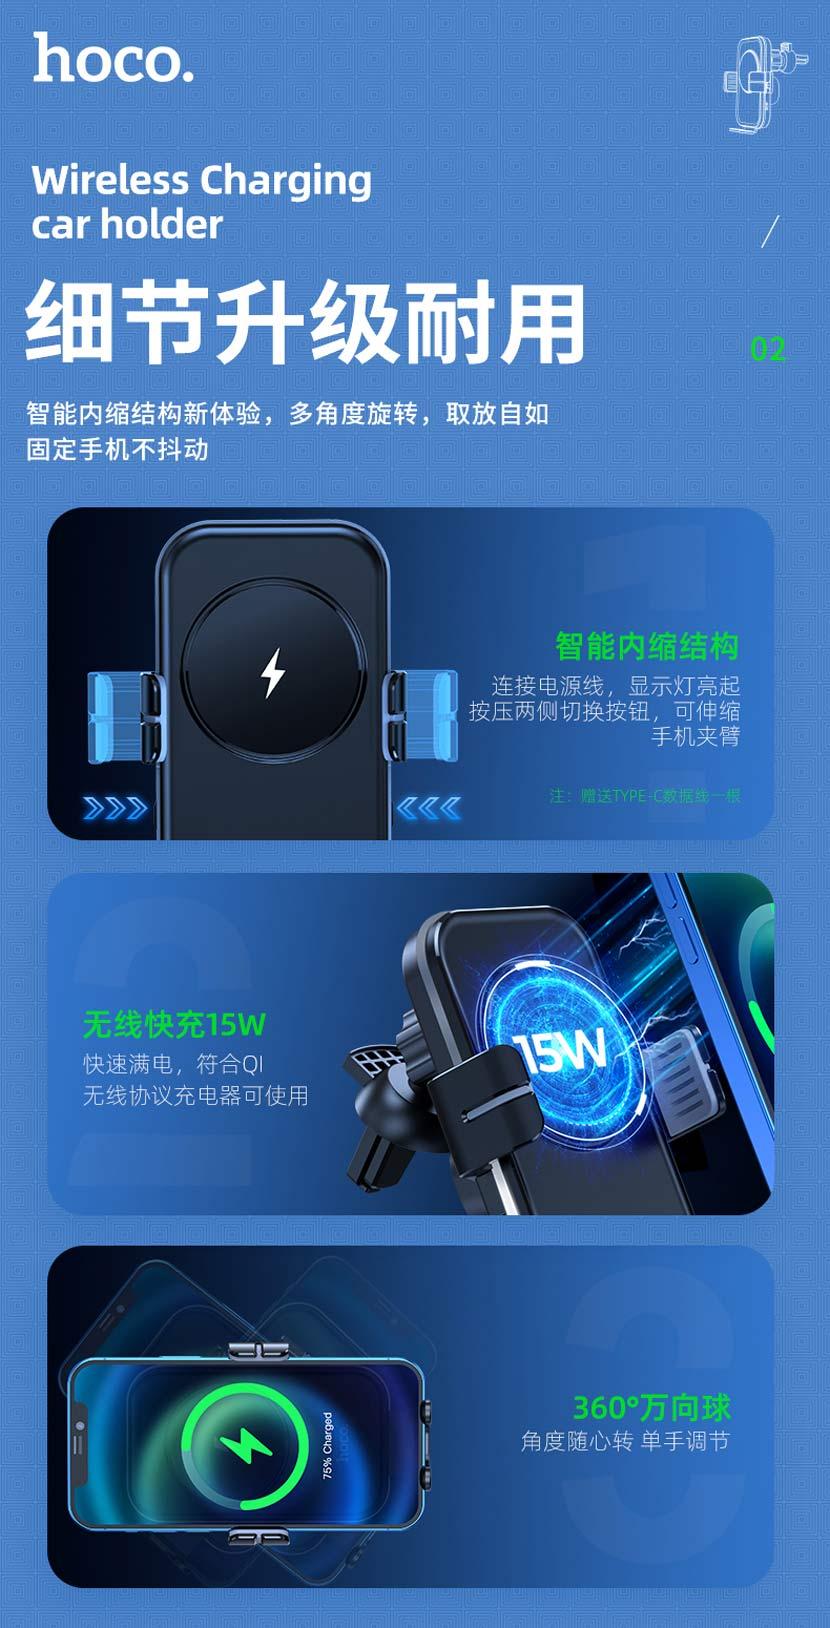 hoco news ca80 buddy smart wireless charging car holder details cn